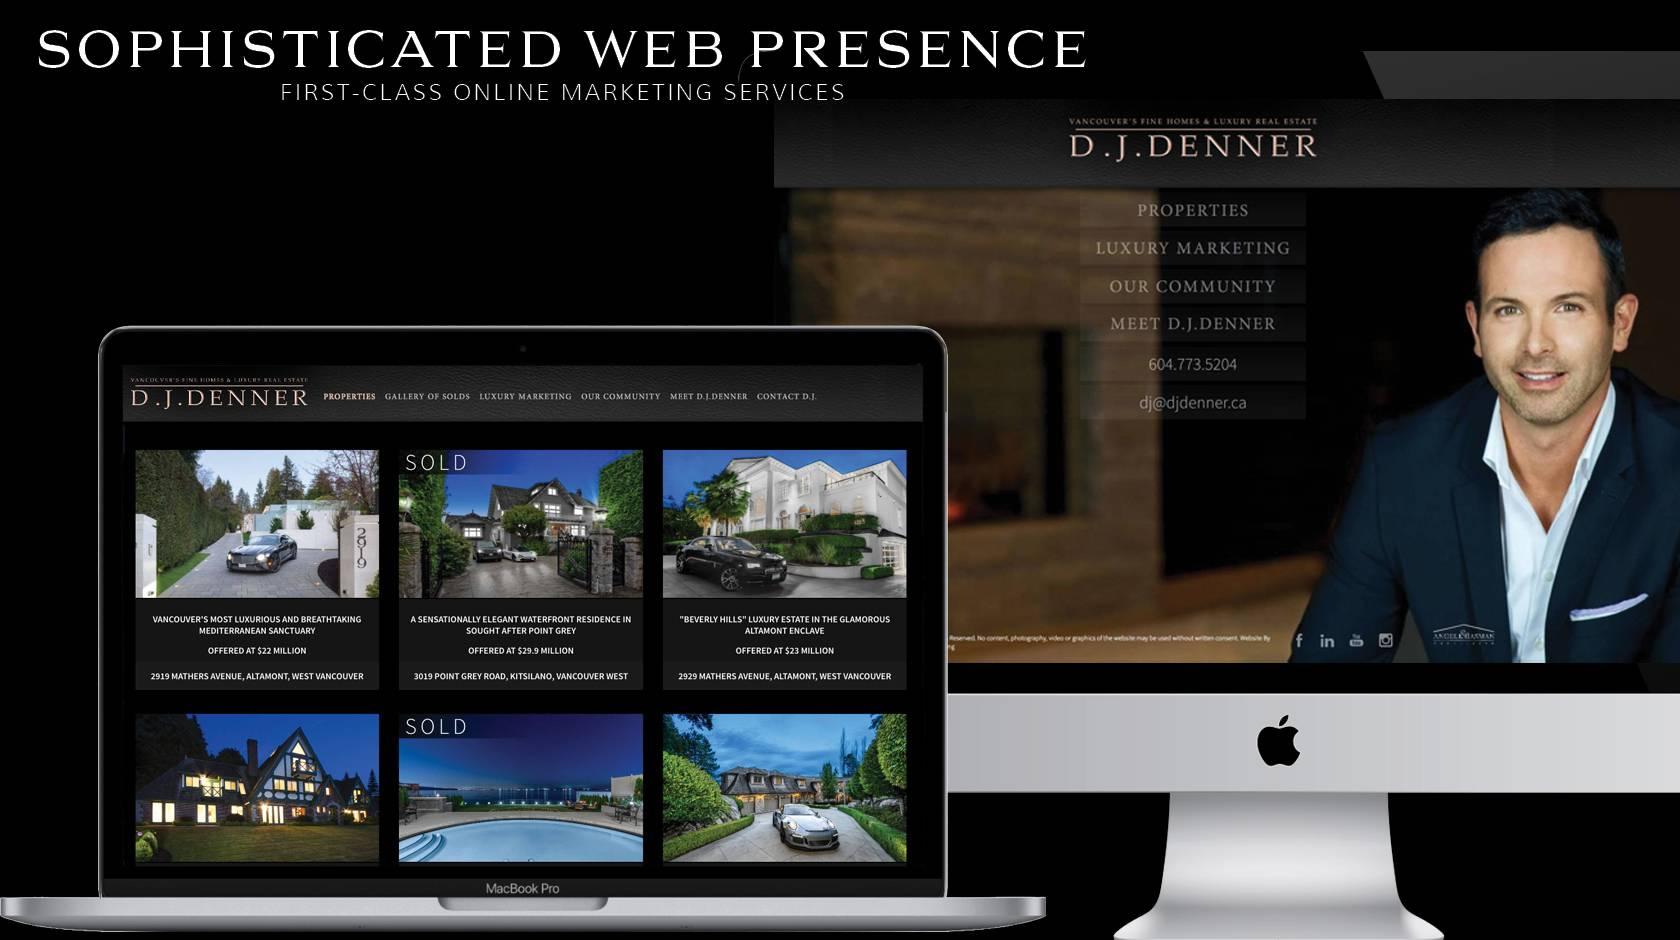 Sophisticated Web Presence